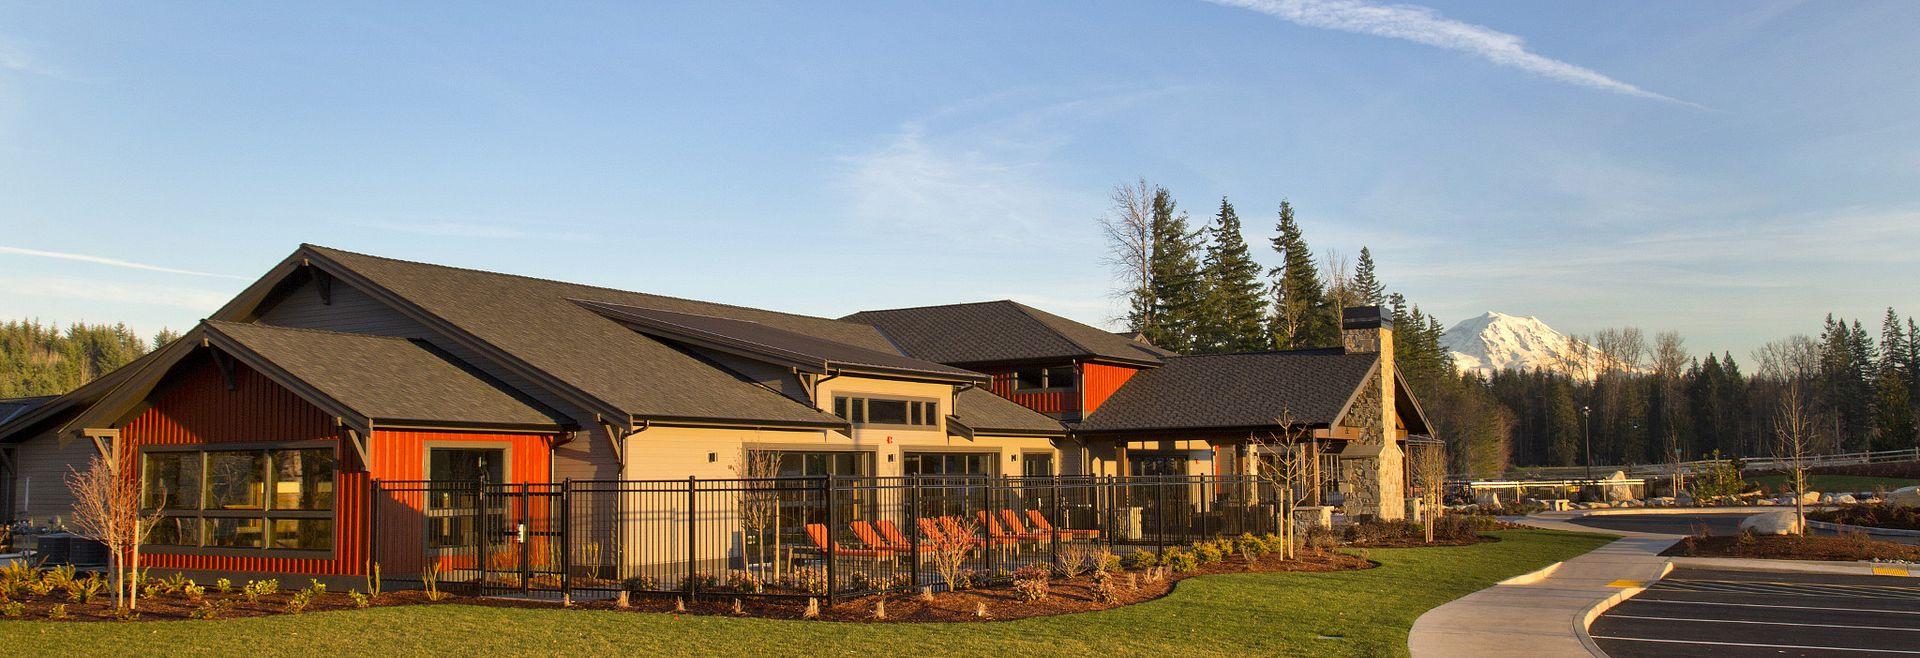 The Lodge at Trilogy at Tehaleh